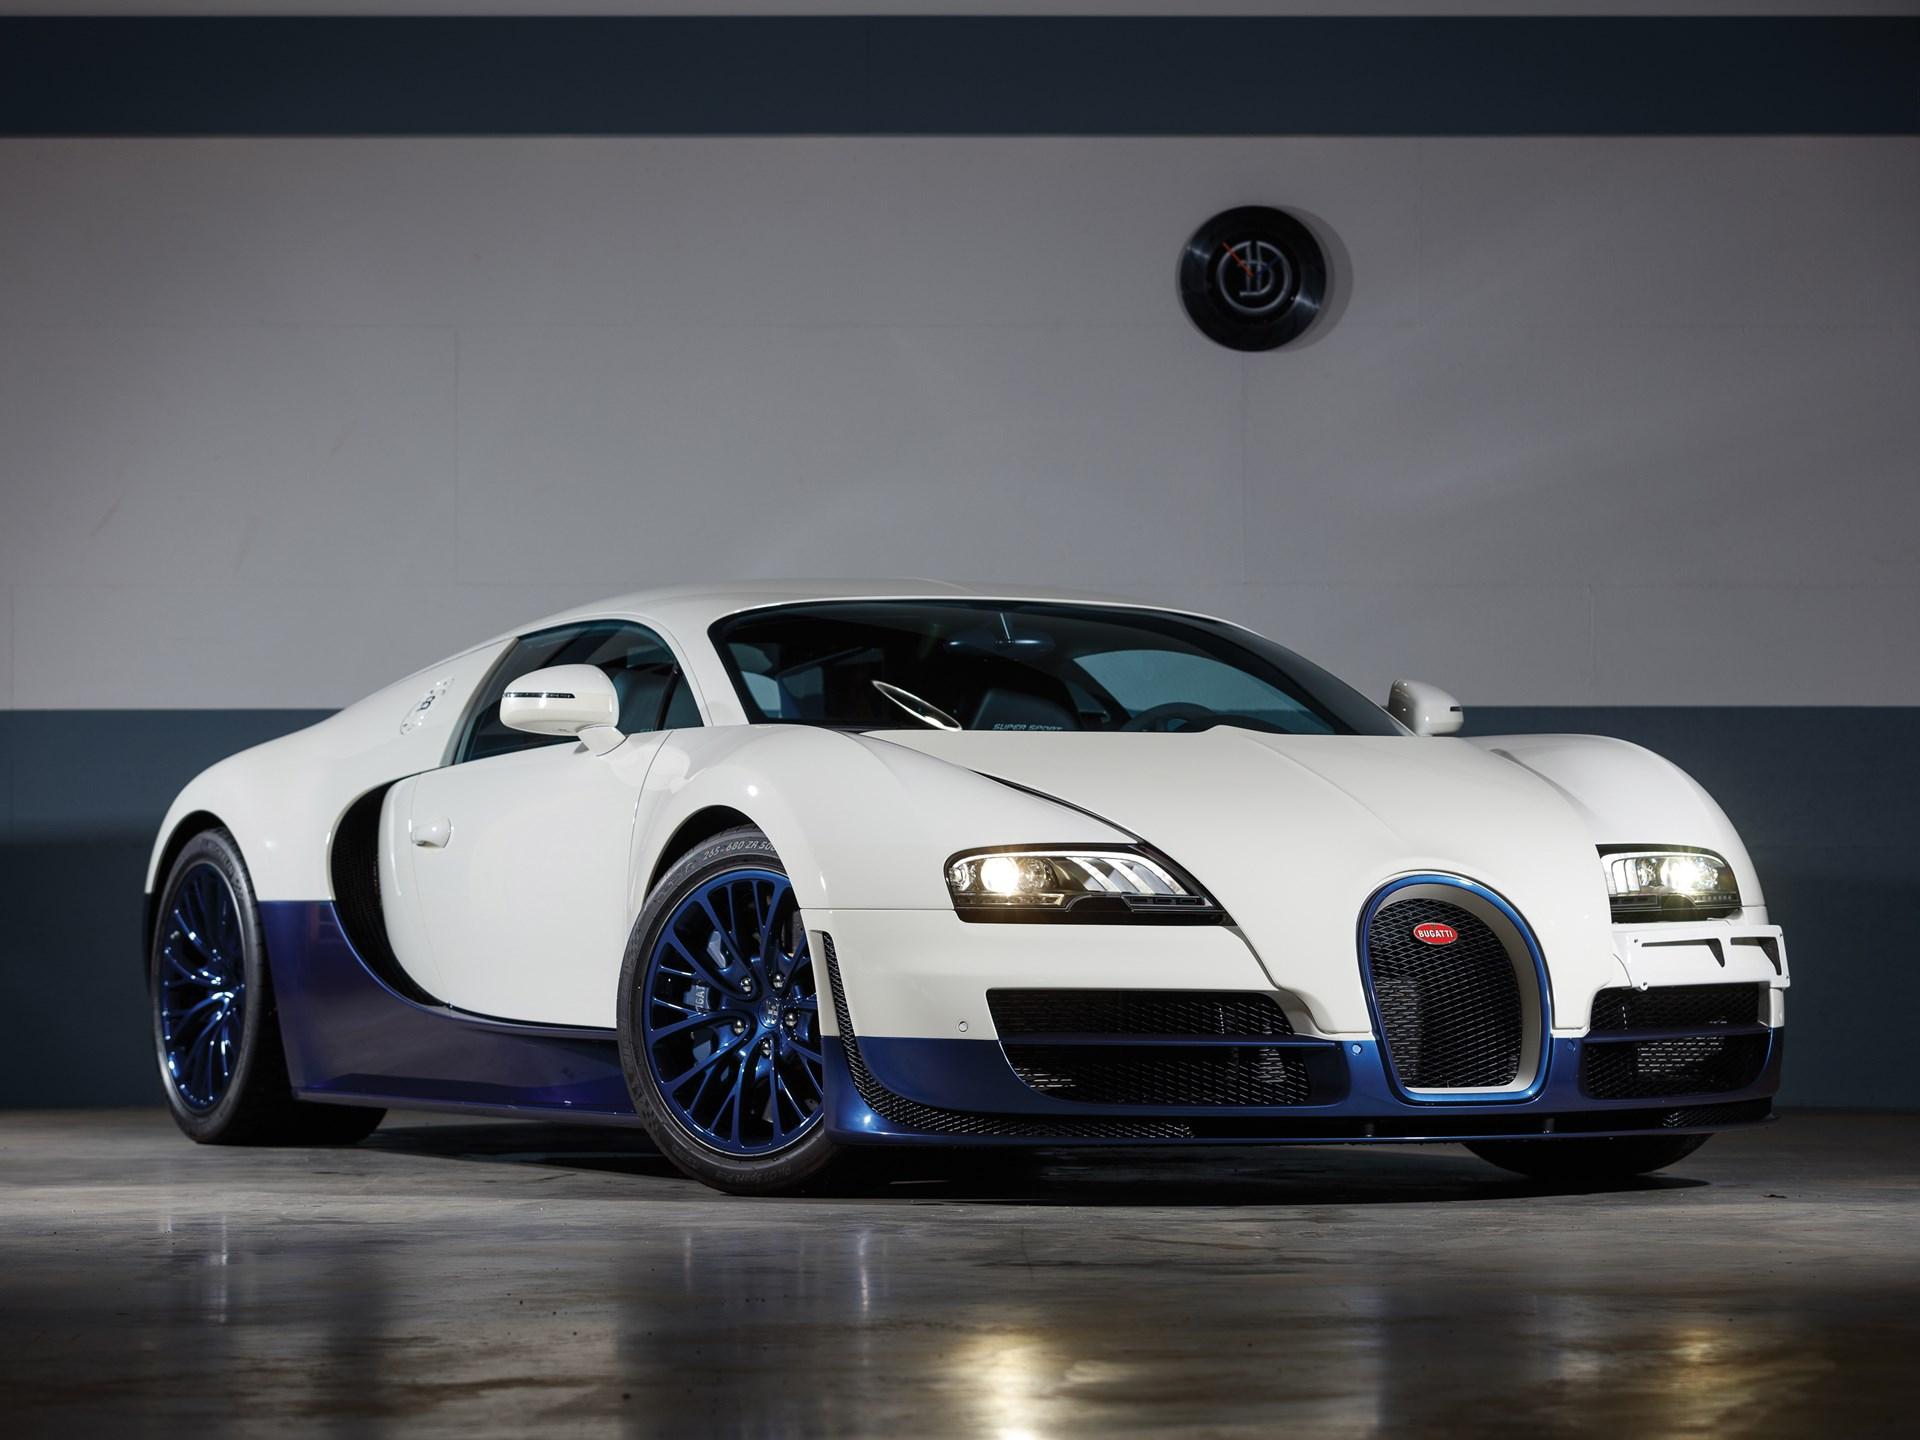 rm sotheby's  2012 bugatti veyron 164 super sport